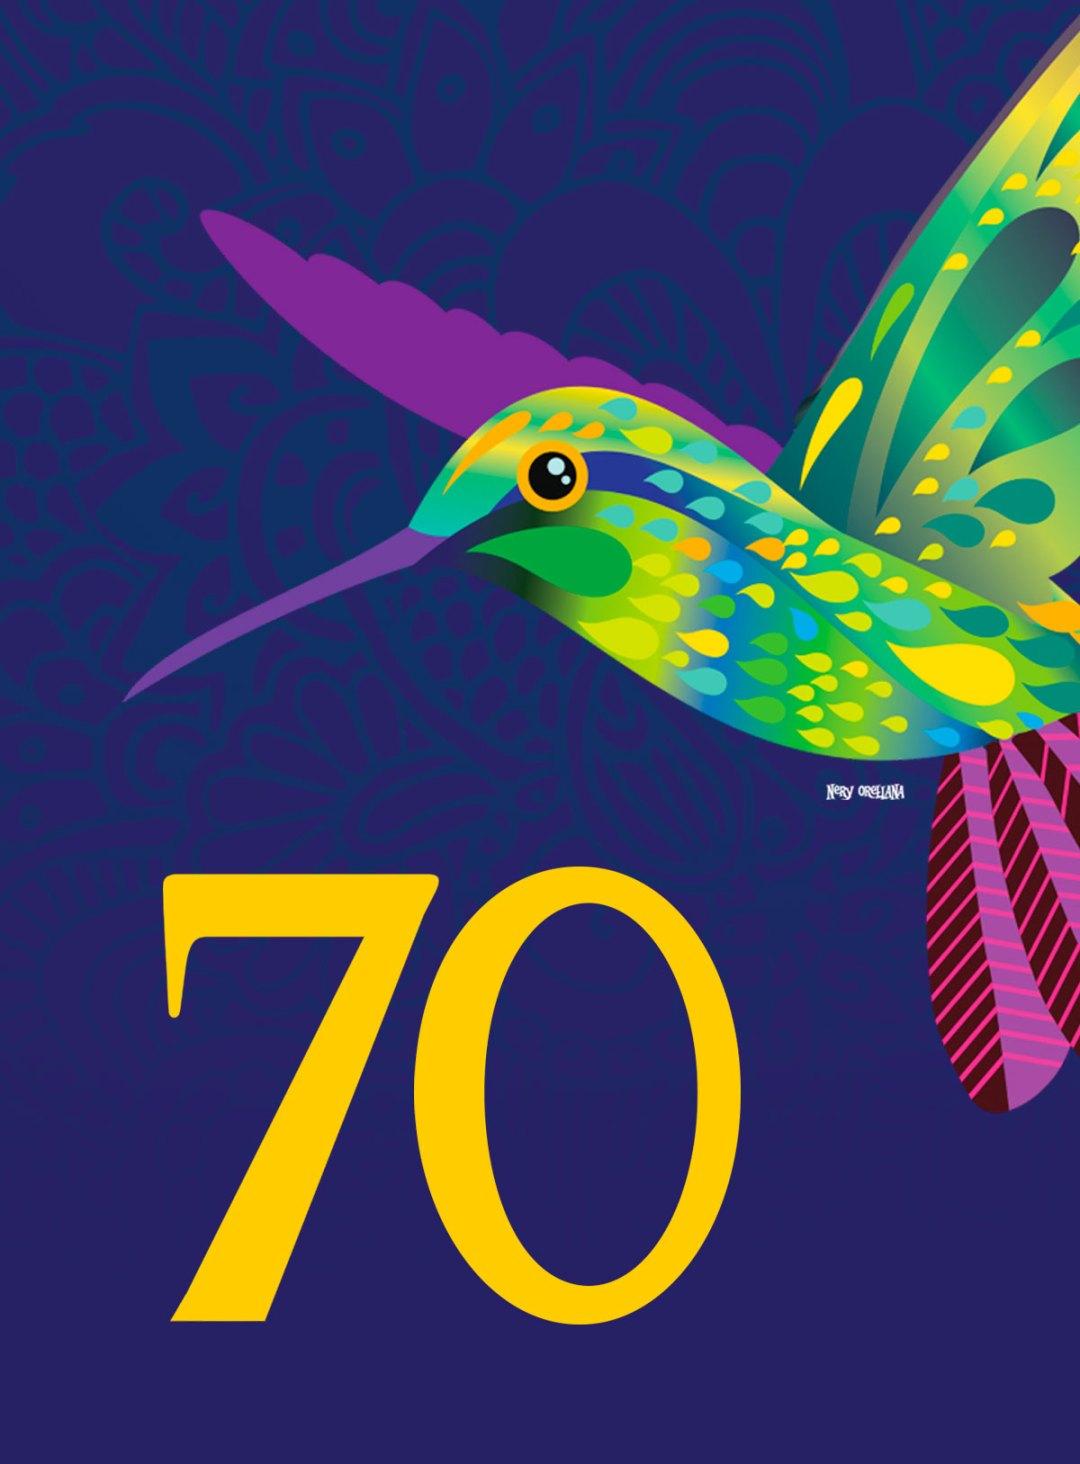 70th Anniversary (Setenta) album cover humming bird.